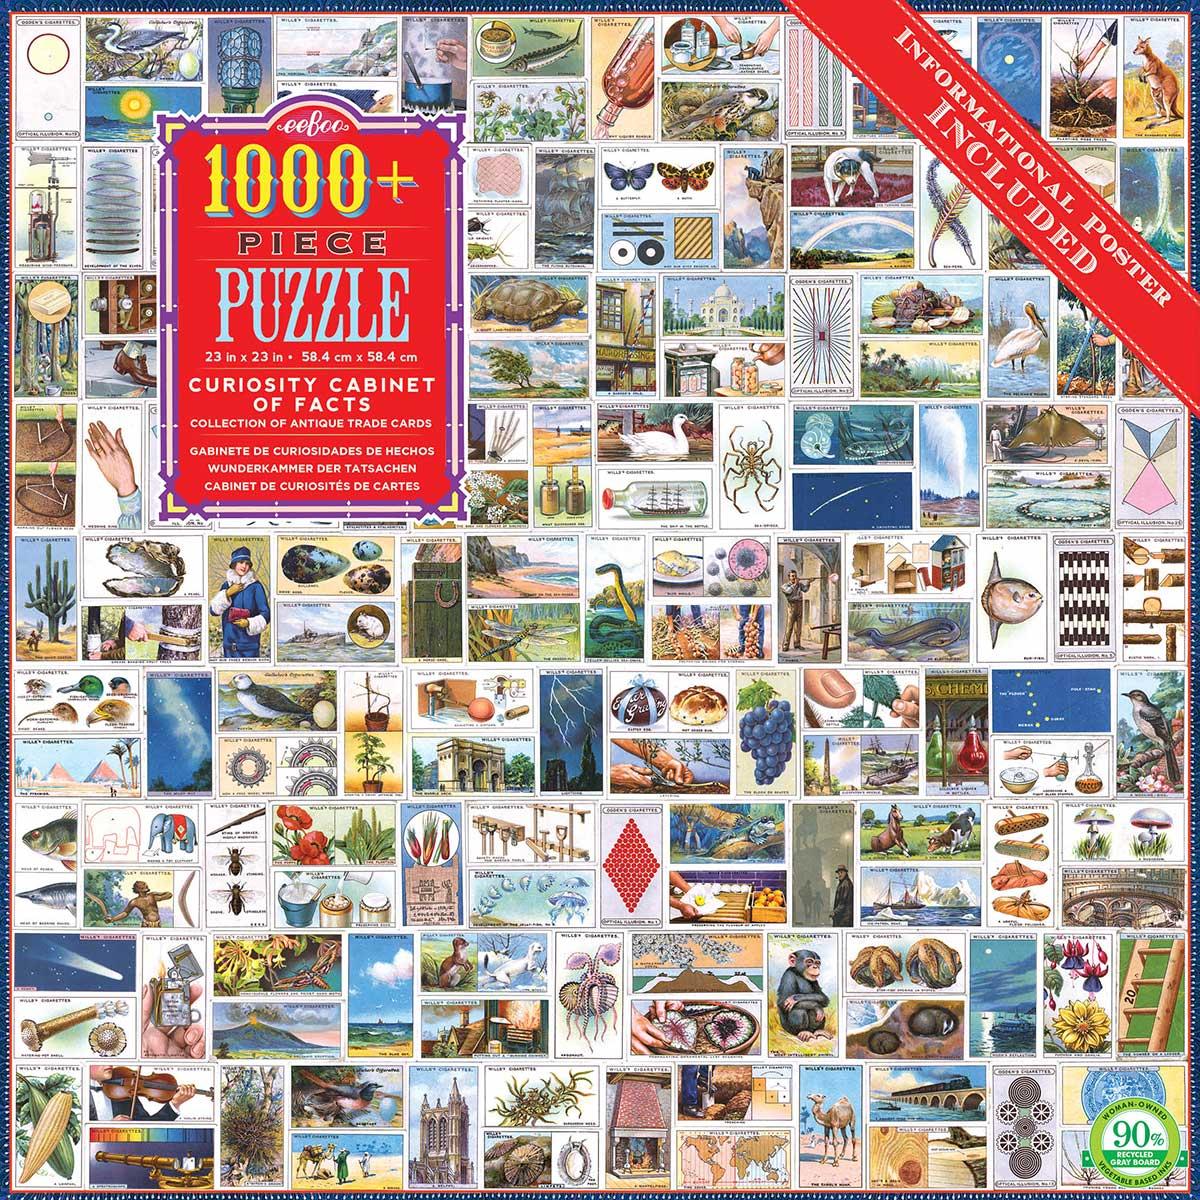 Curiosity Cabinet of Facts Nostalgic / Retro Jigsaw Puzzle